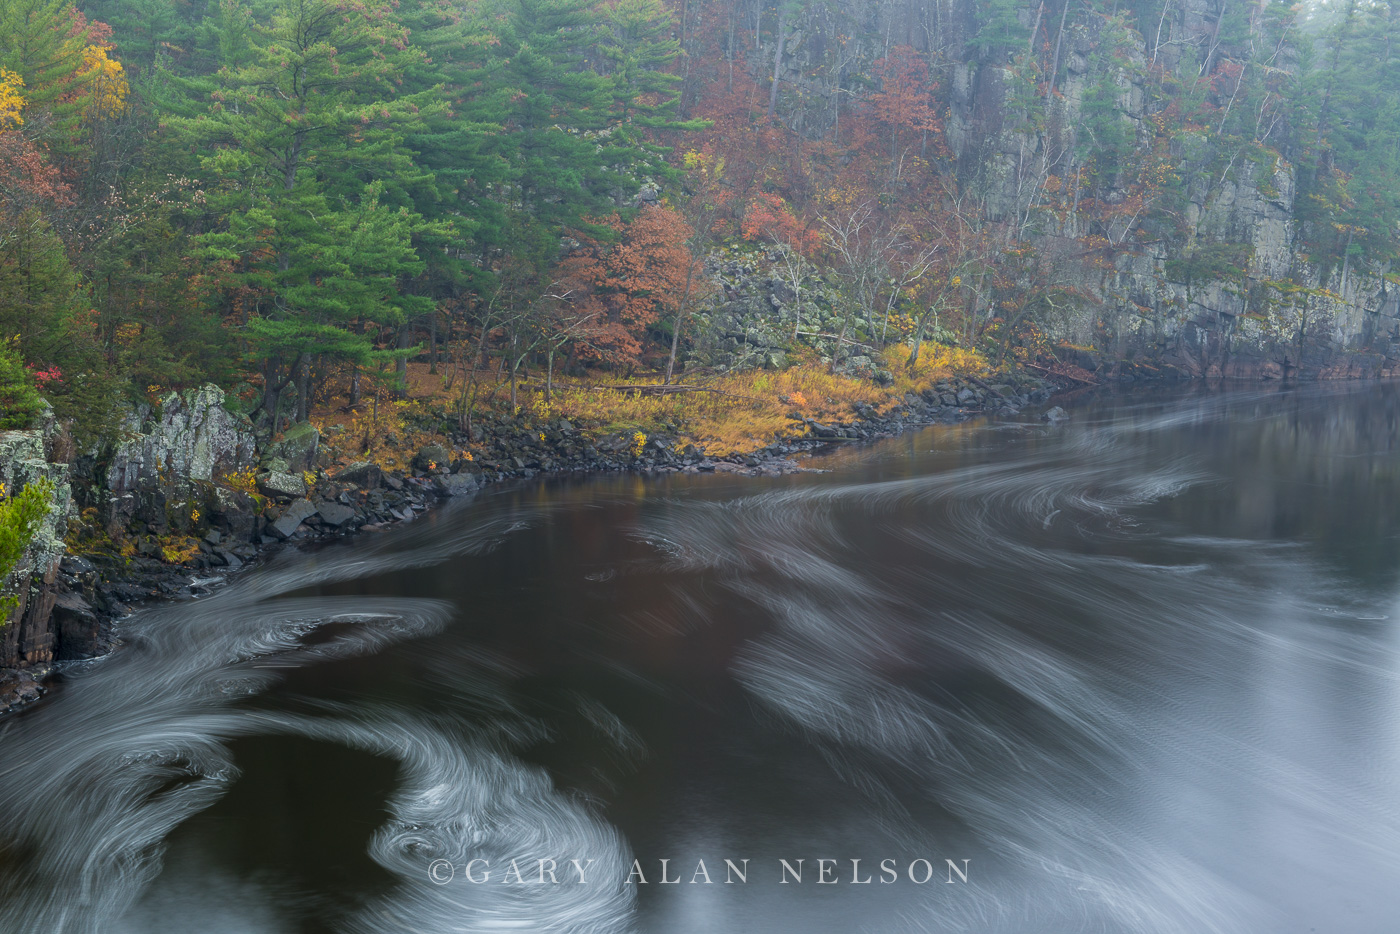 st. croix river, minnesota, national scenic river, photo